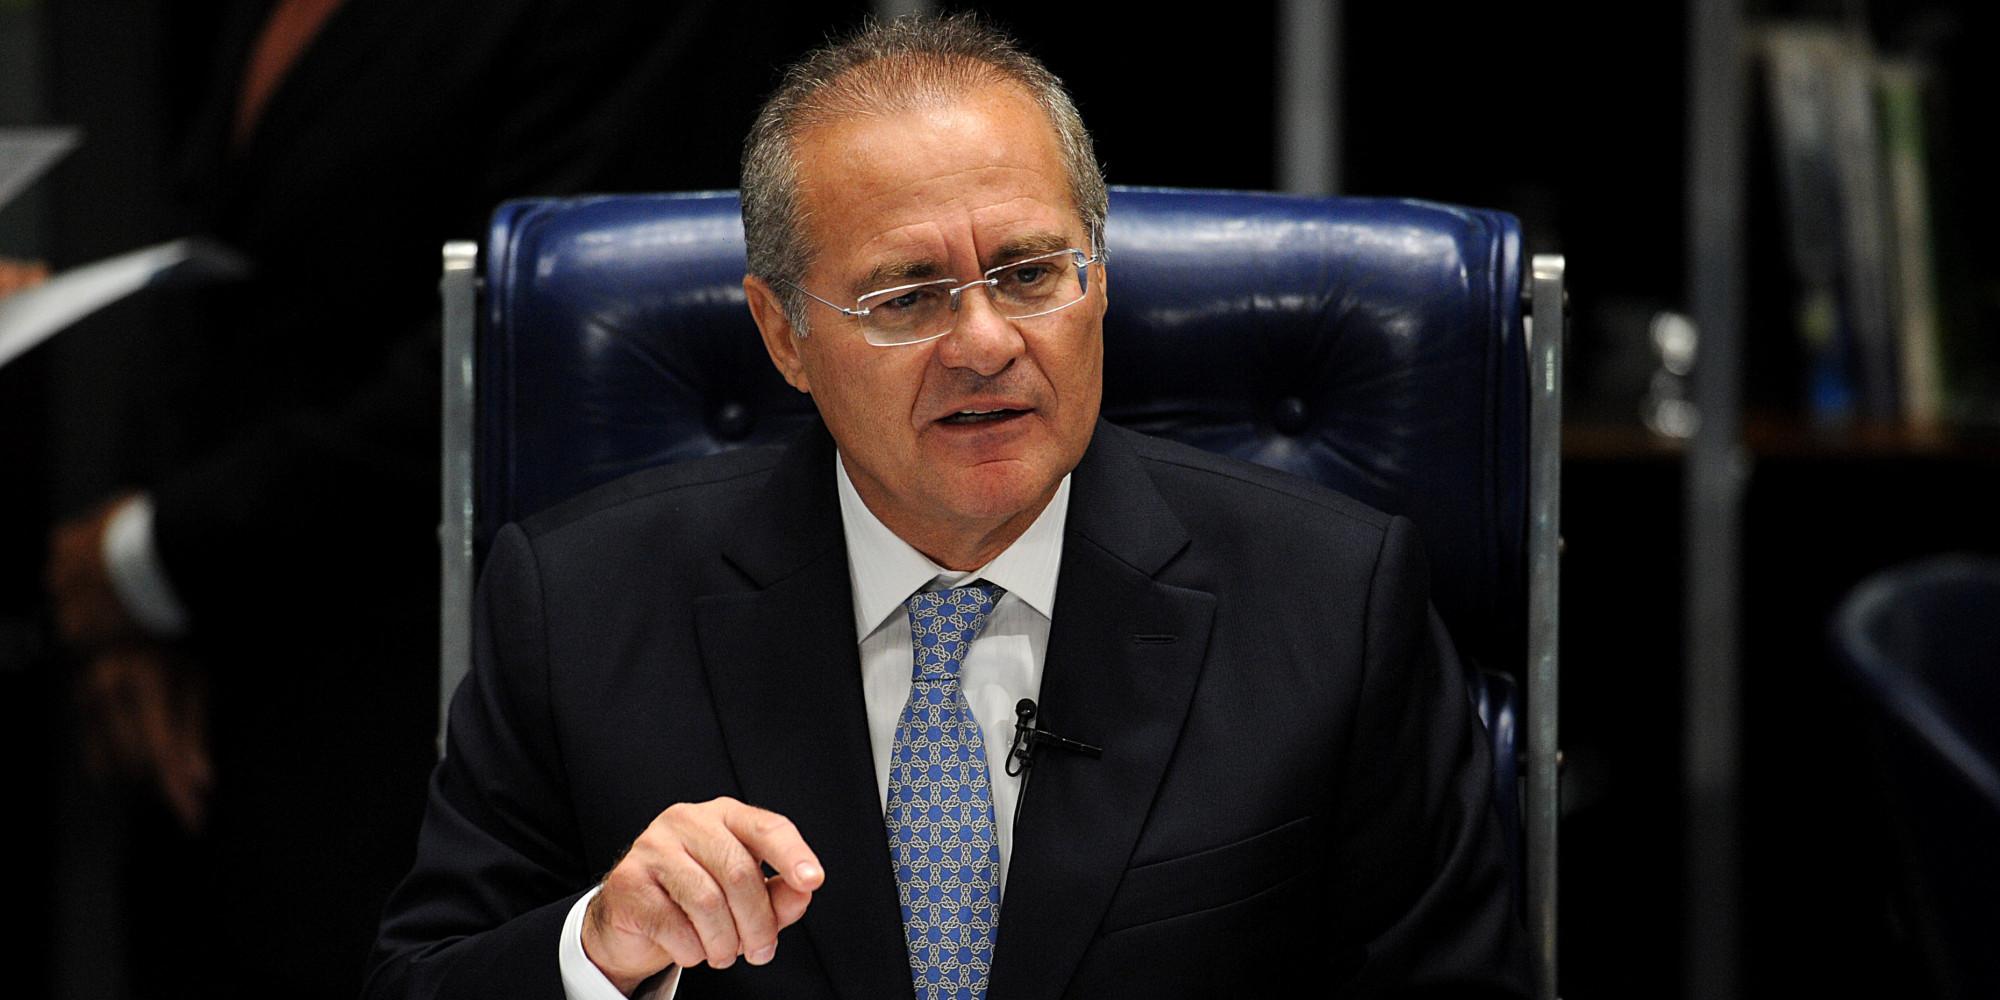 "Renan Calheiros teria um ""representante"" que negociava propinas, diz o delator Paulo Roberto Costa"